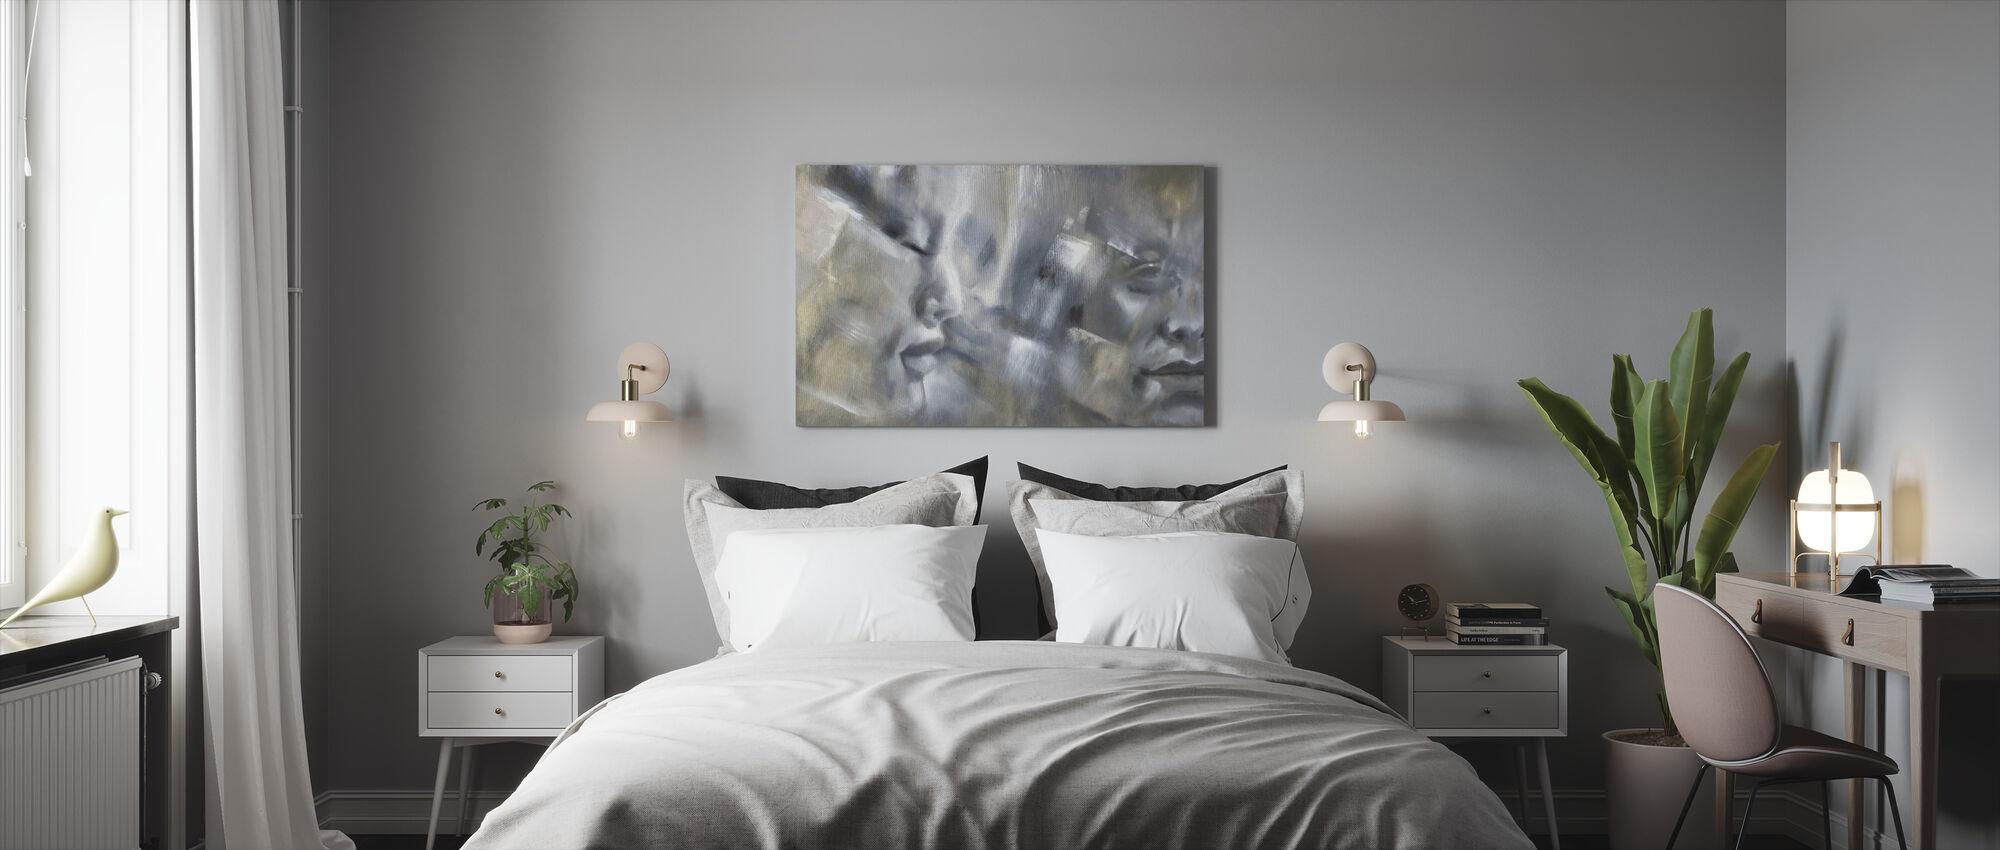 Faces - Canvas print - Bedroom